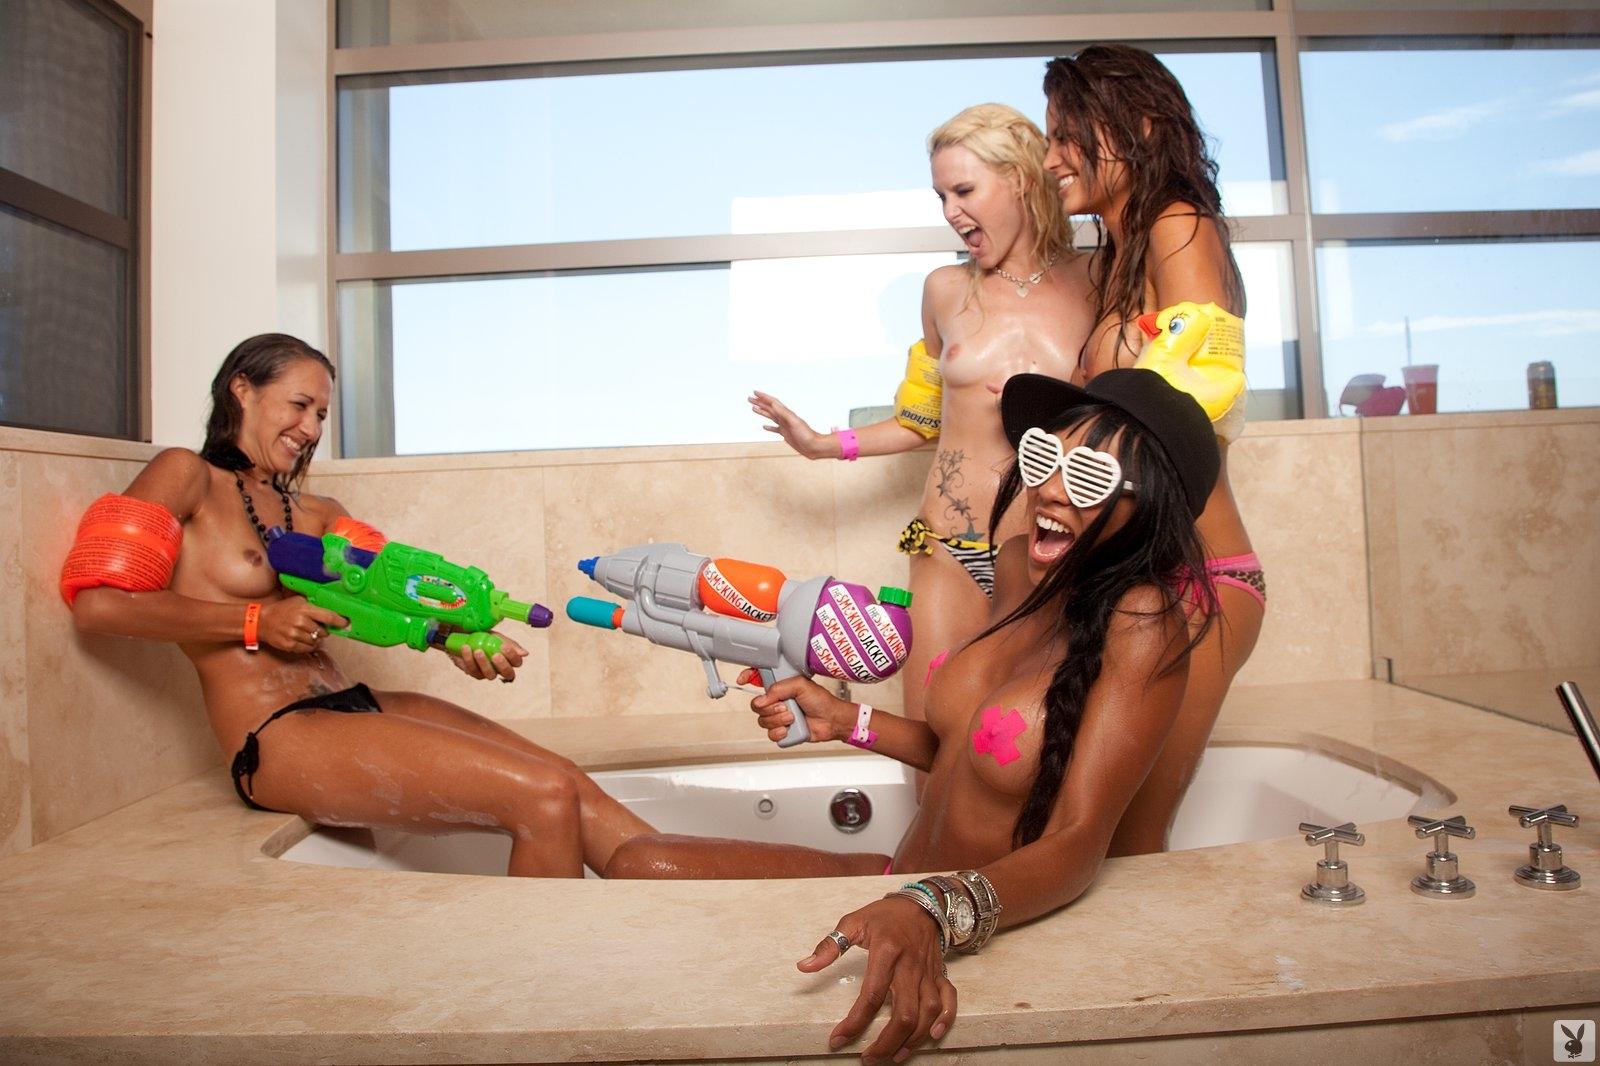 Playboy's Beach House Episode 02 Playboy Plus (2)